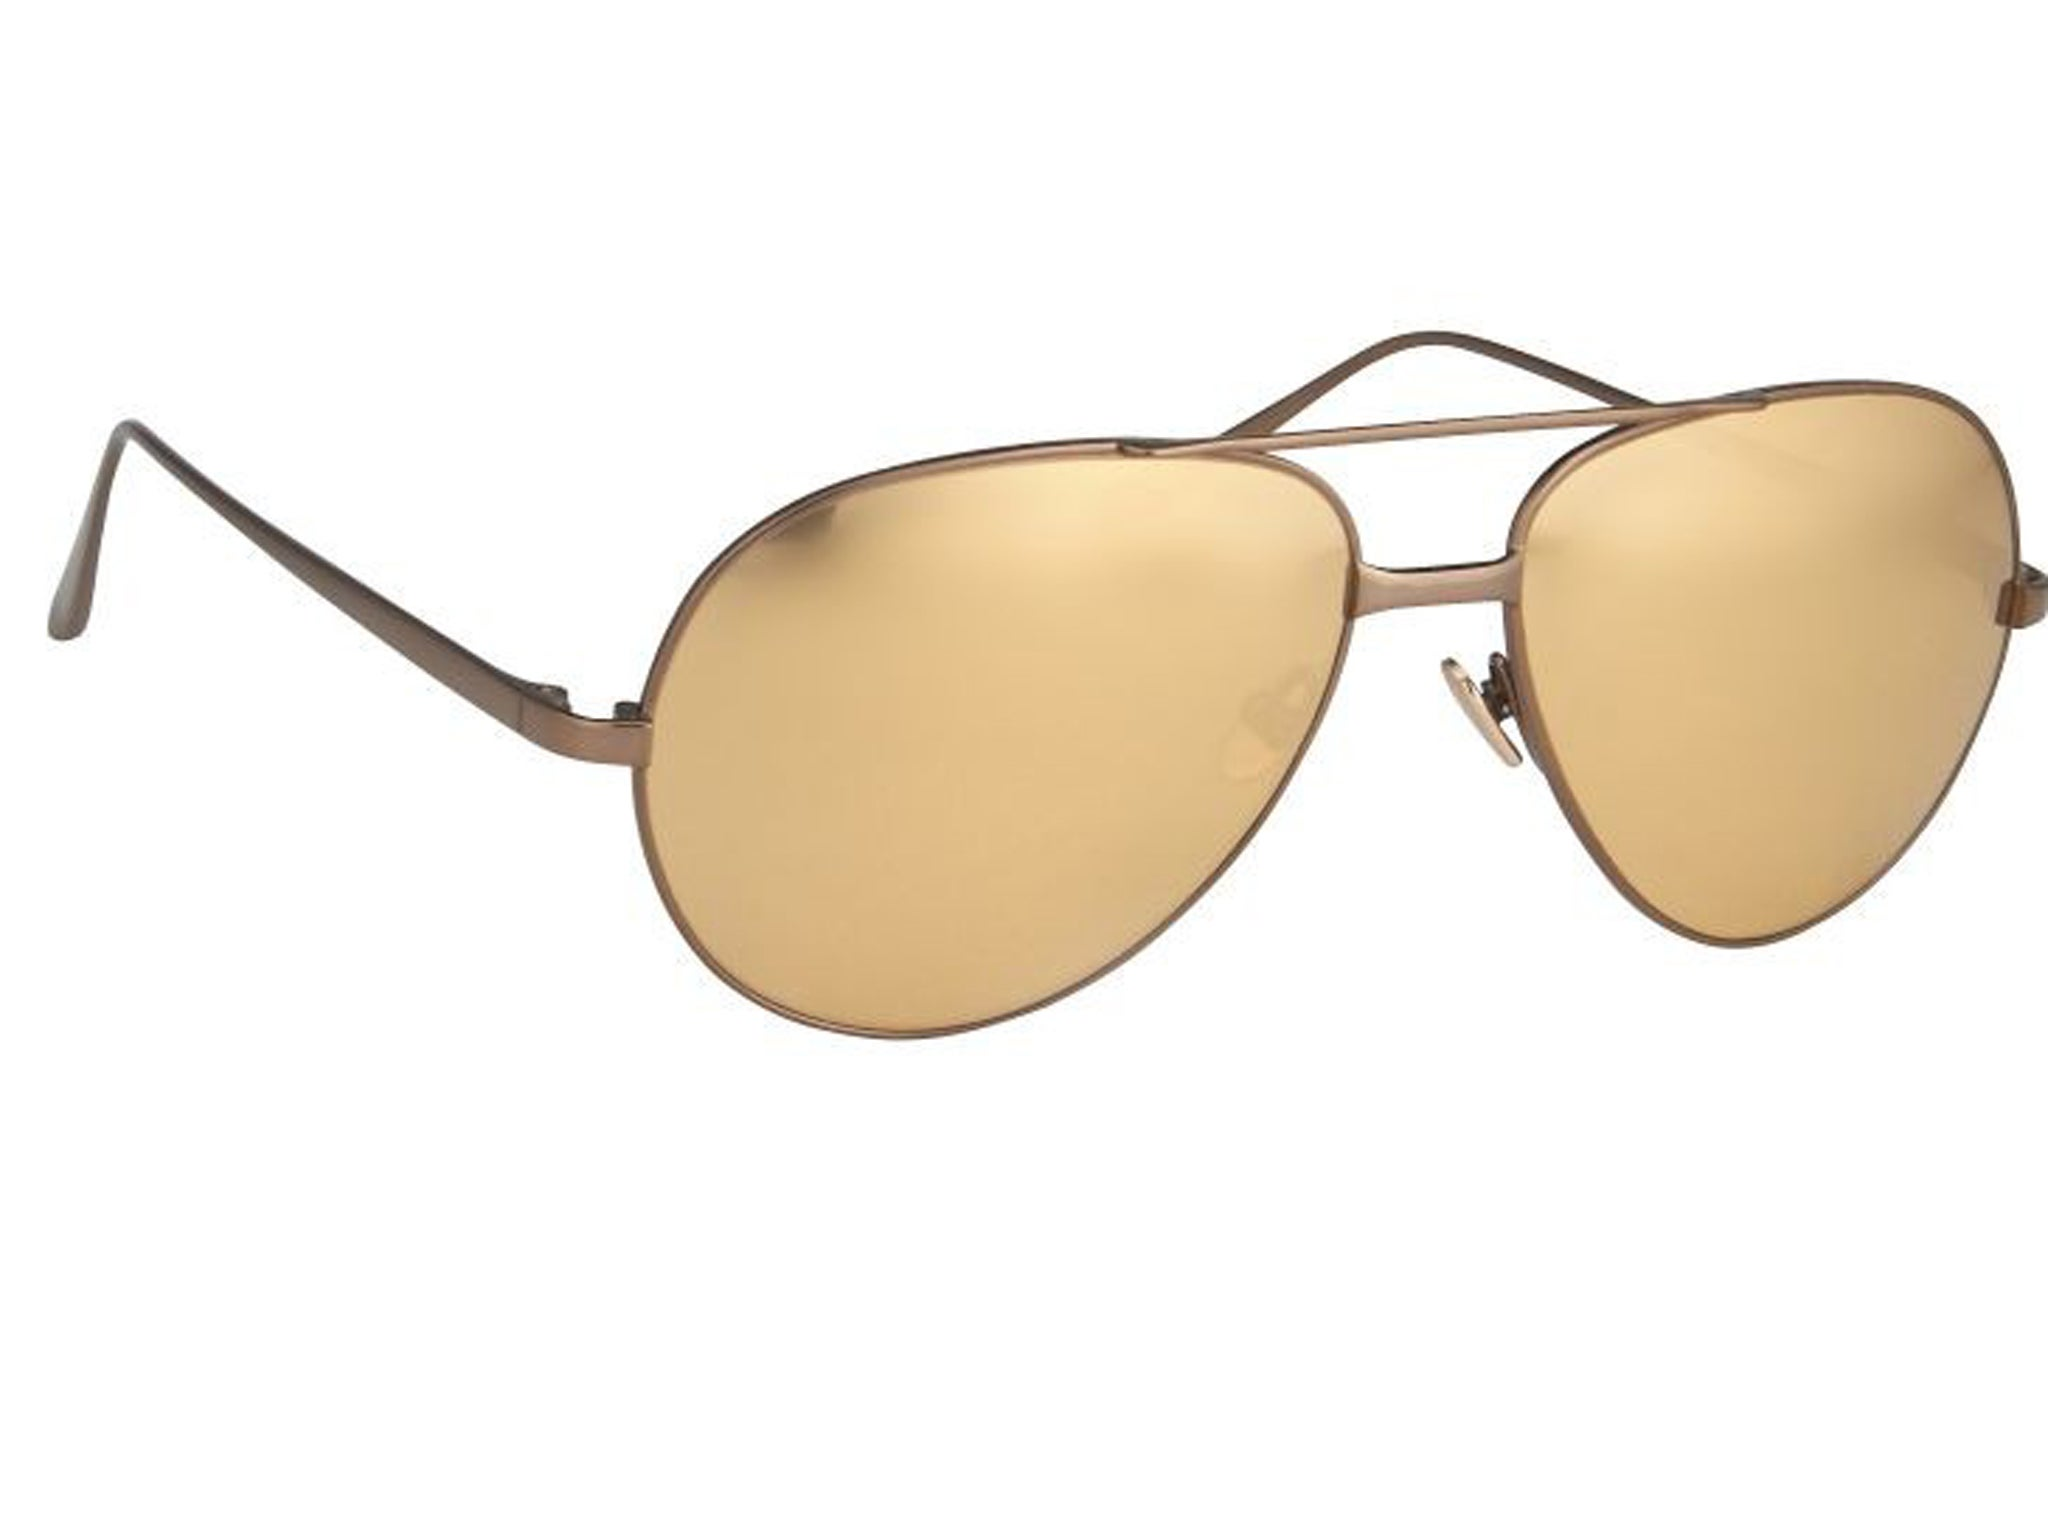 2bf28c264b7e In the frame: Linda Farrow - brains behind sunglasses brand delving ...